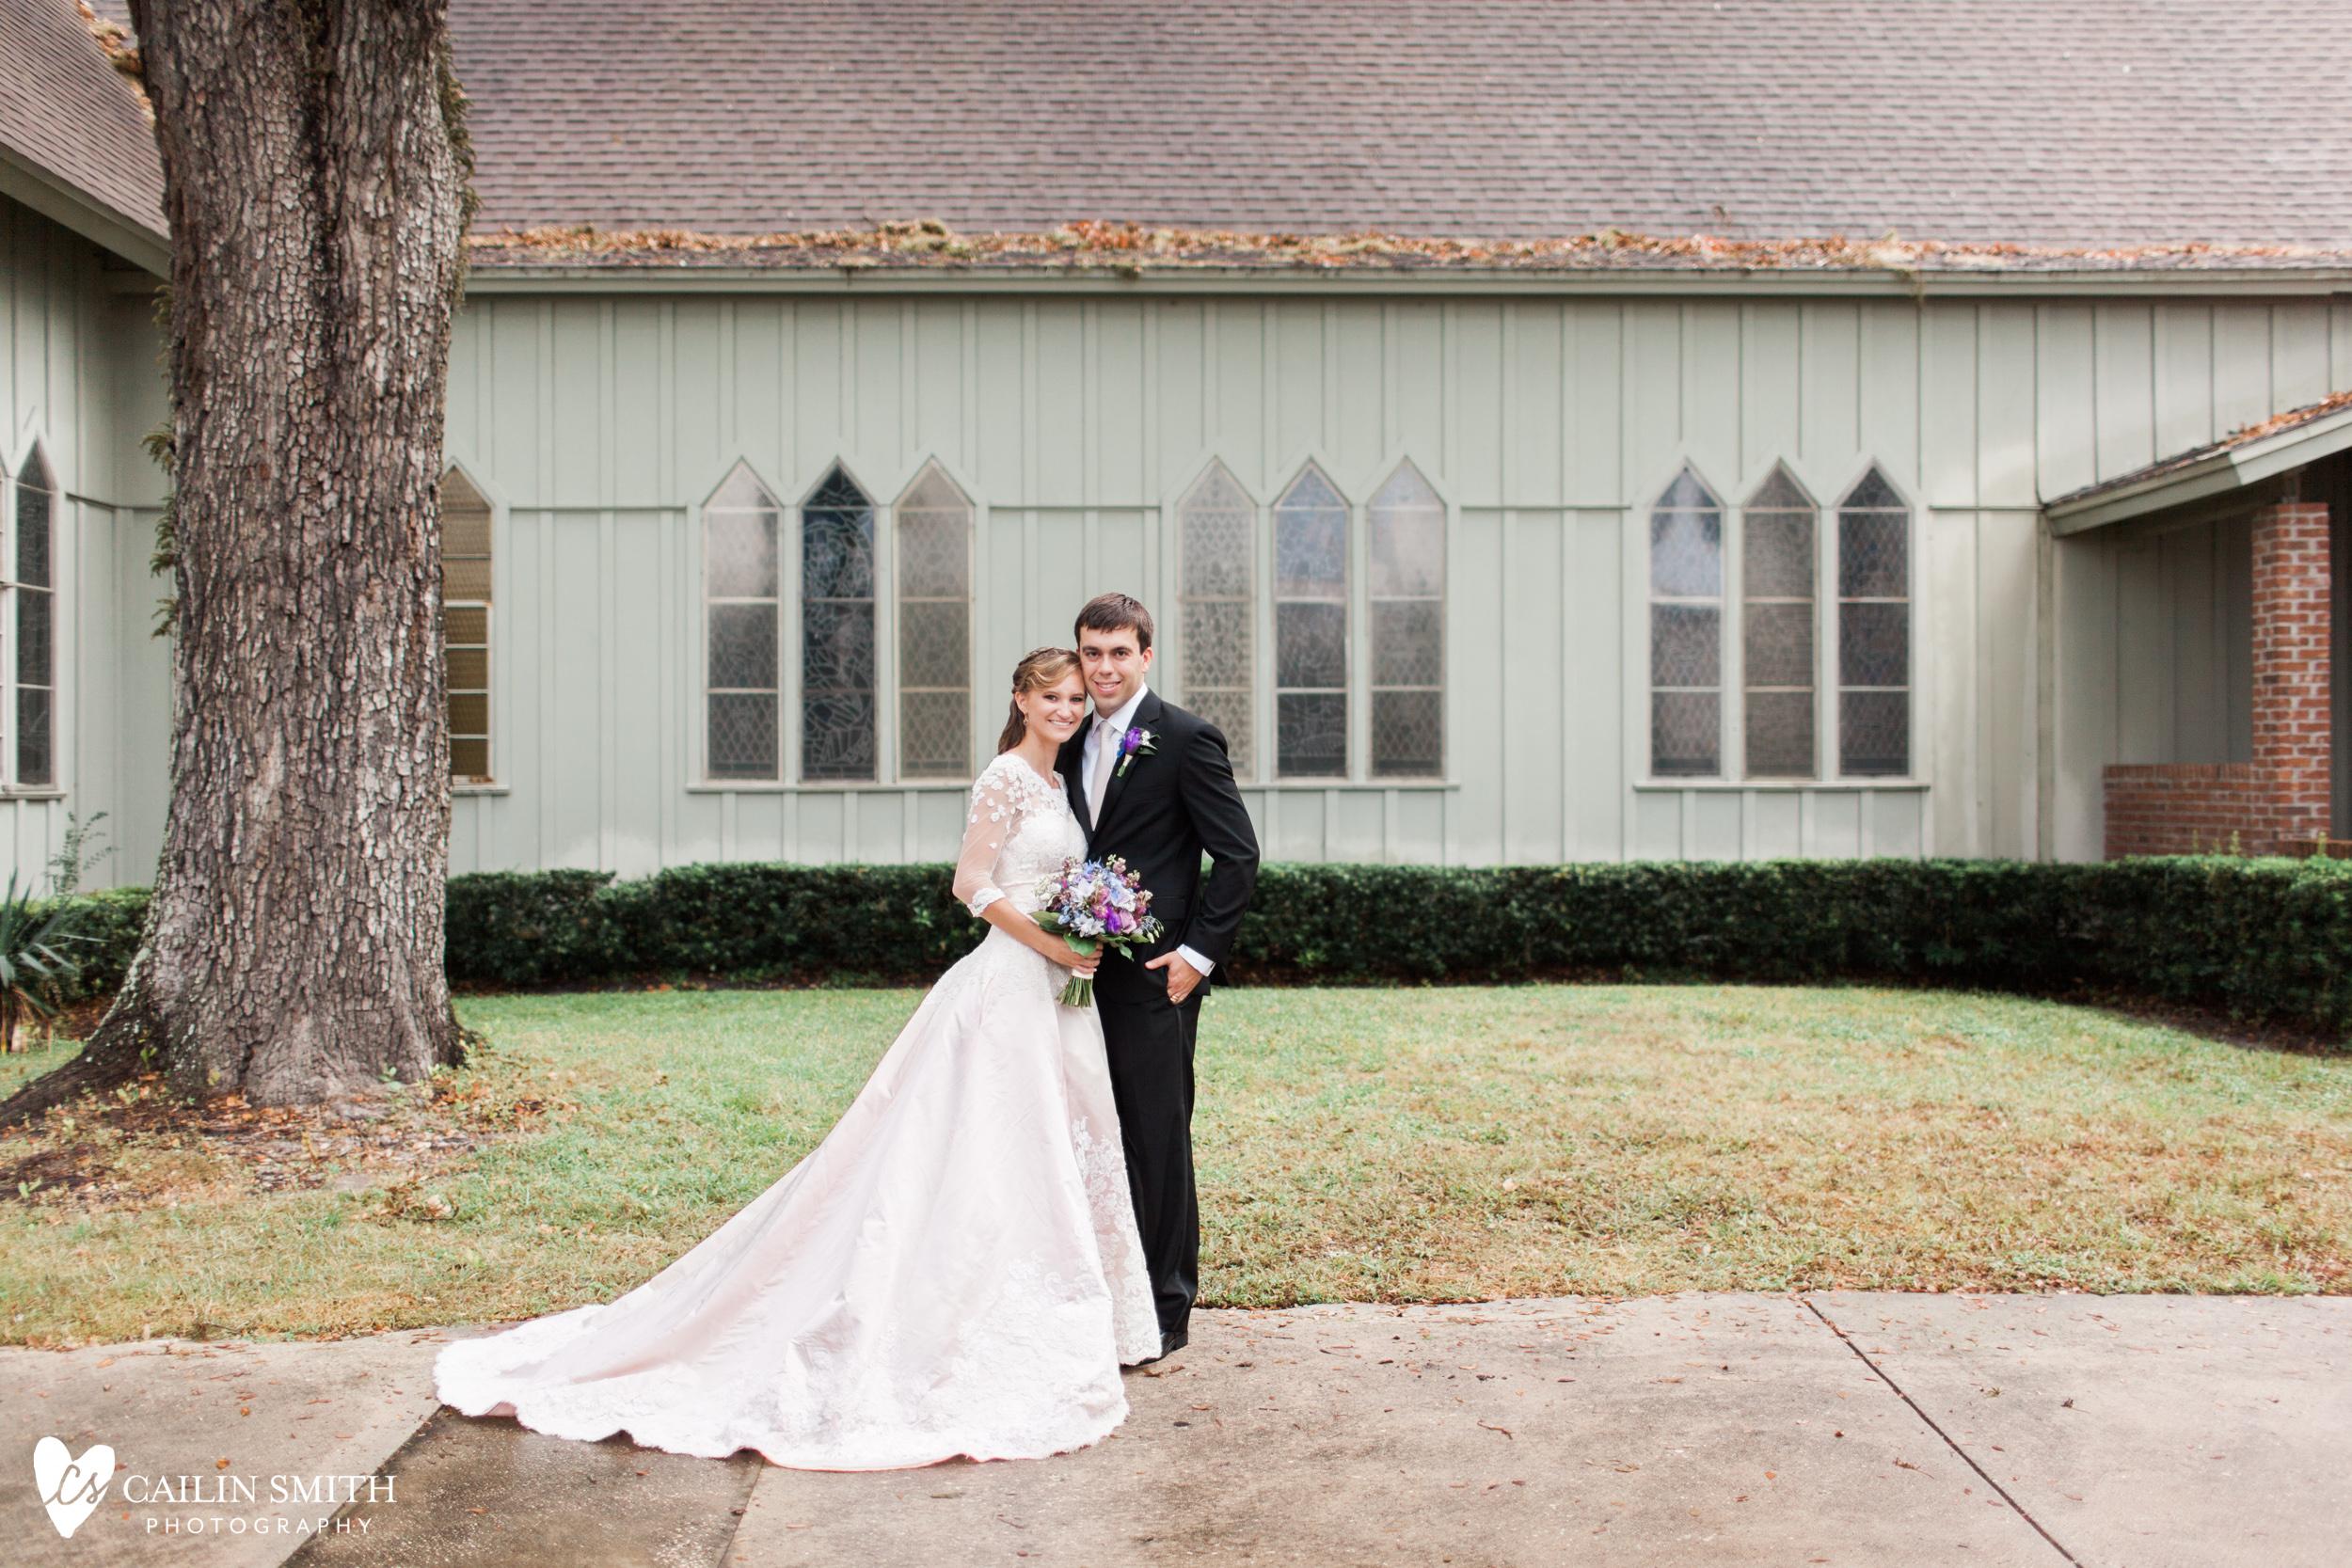 Shannon_David_Grace_Episcopal_Church_Wedding_photography_004.jpg